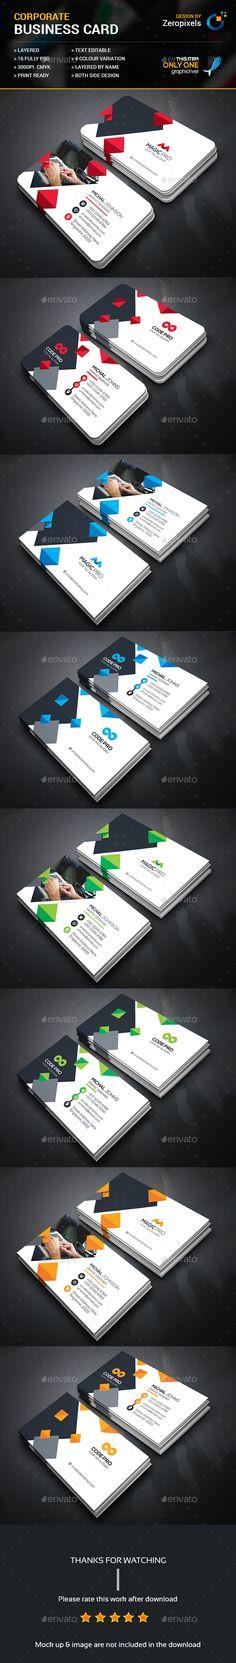 Business Card Templates PSD Bundle. Download here: https://graphicriver.net/item/business-card-bundle/17626105?ref=ksioks